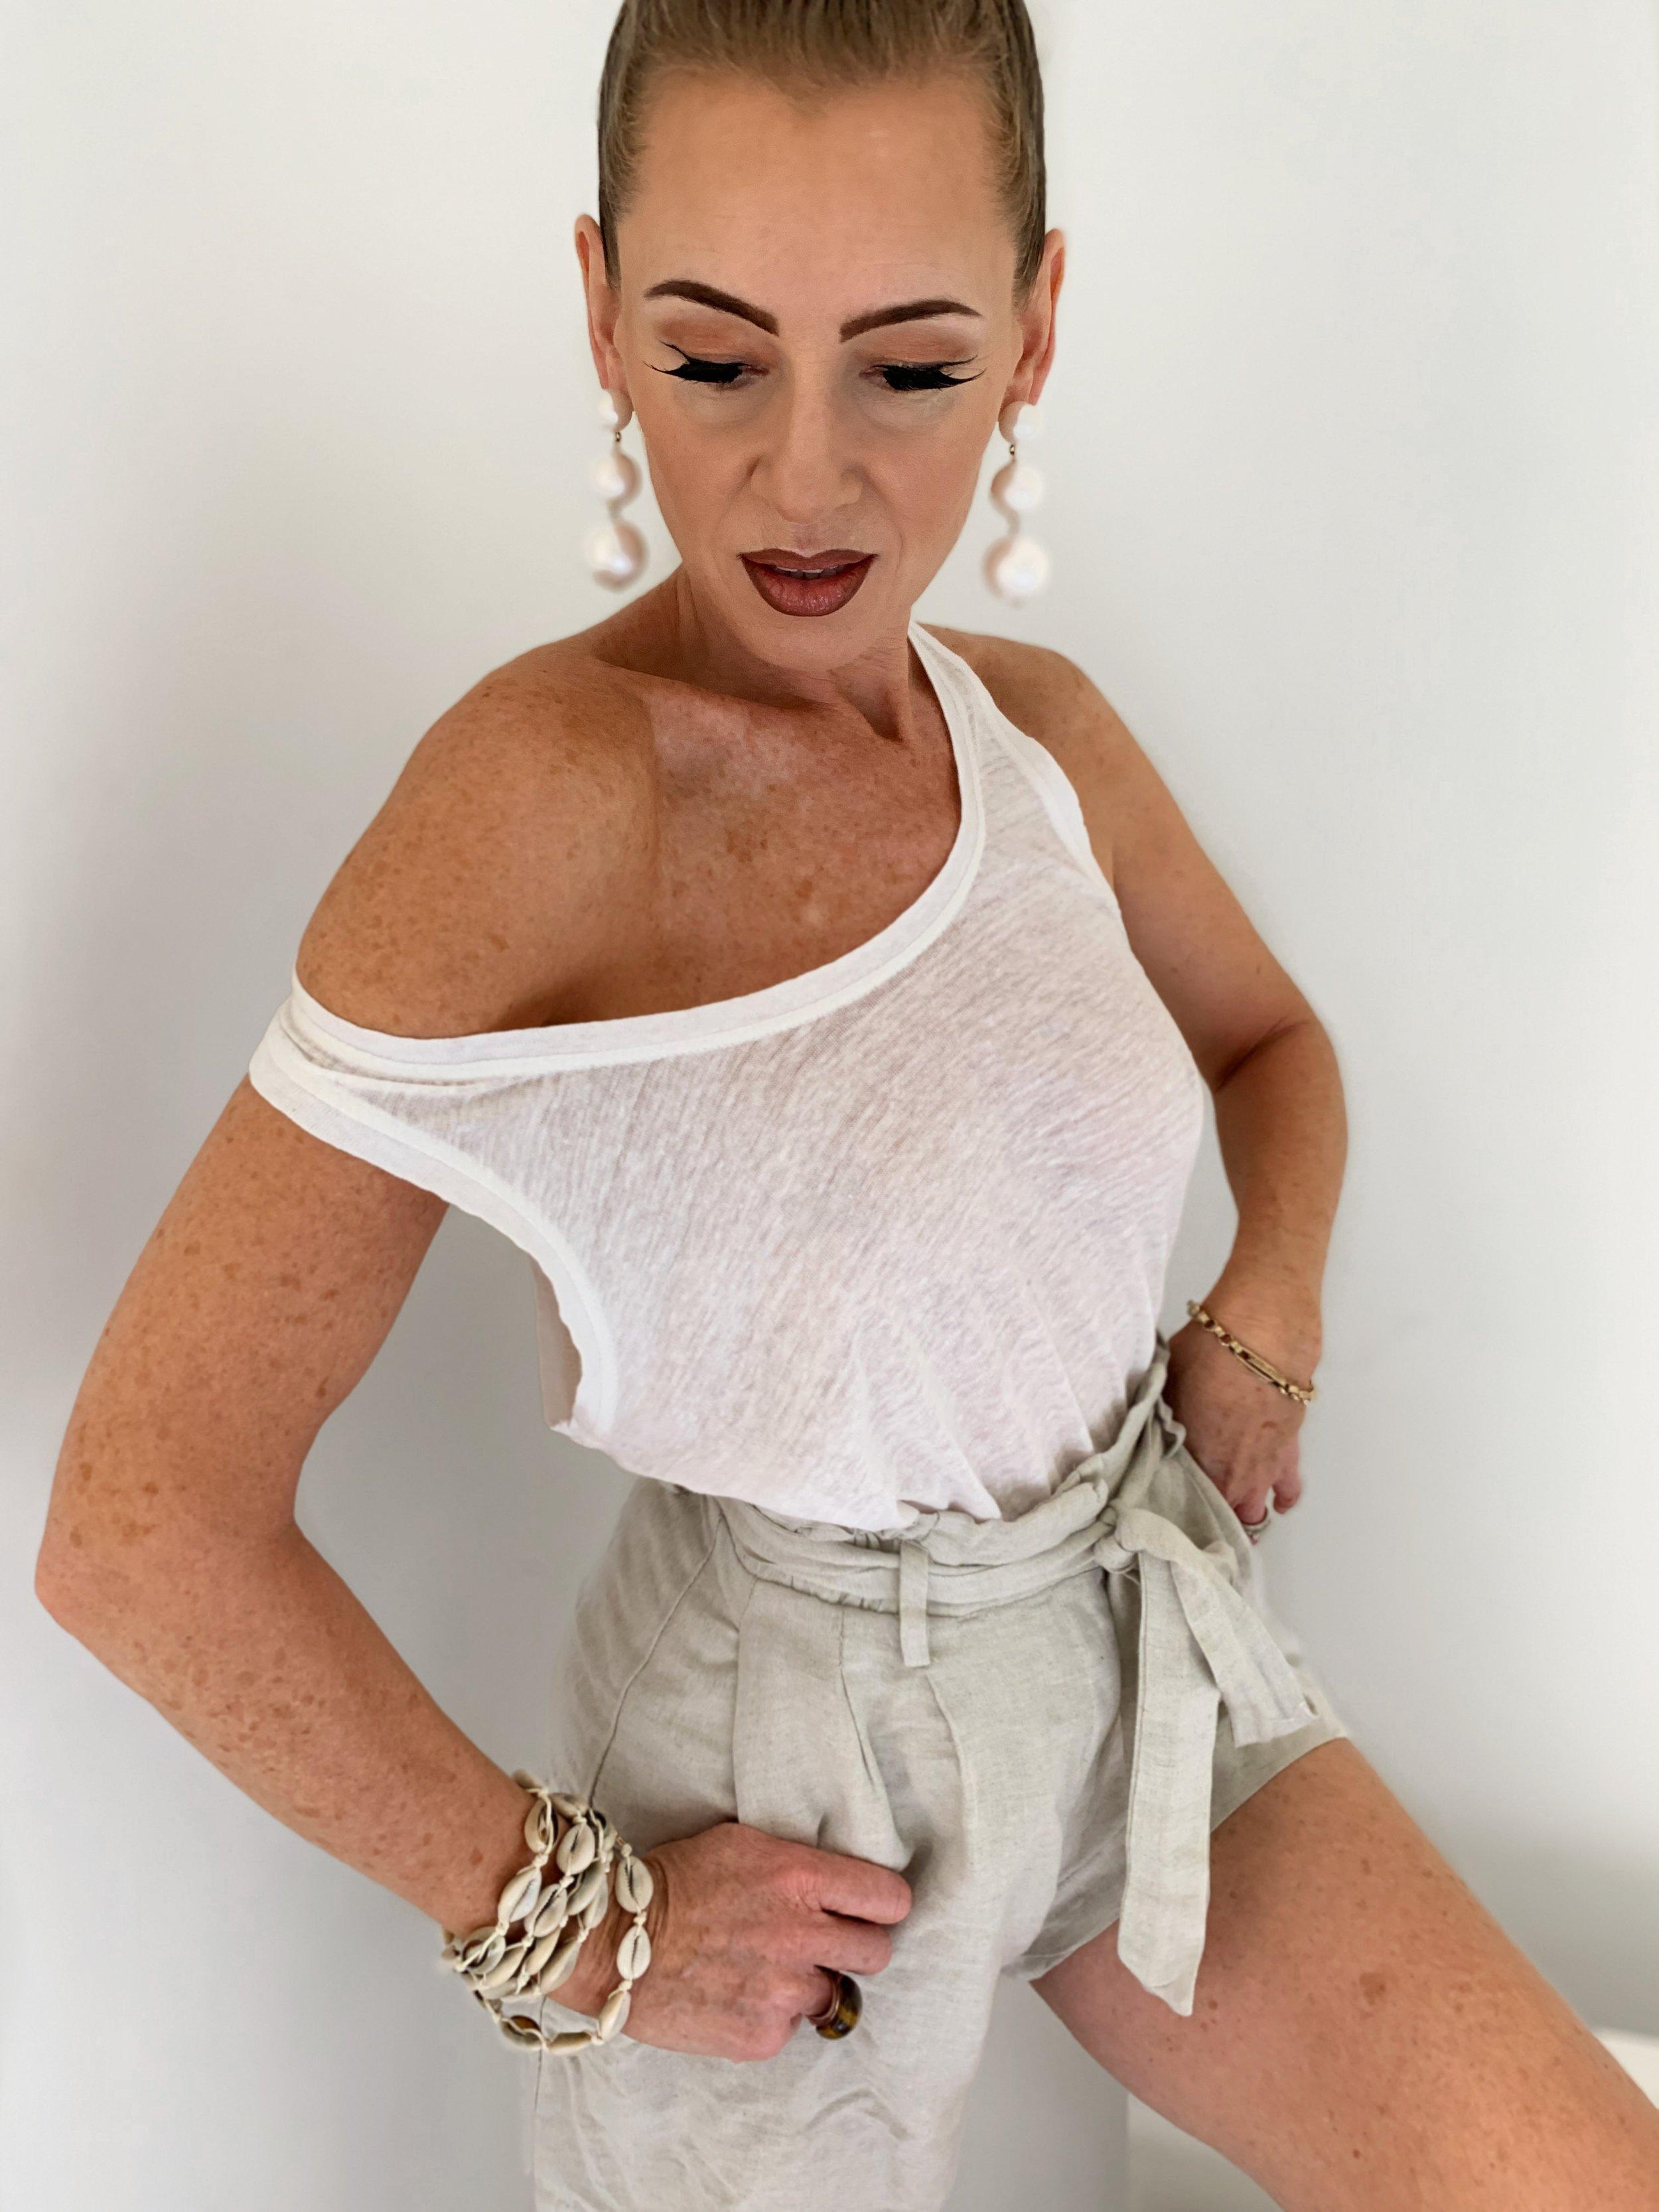 Wearing Tan Luxe gradual self tanner in Light/Medium